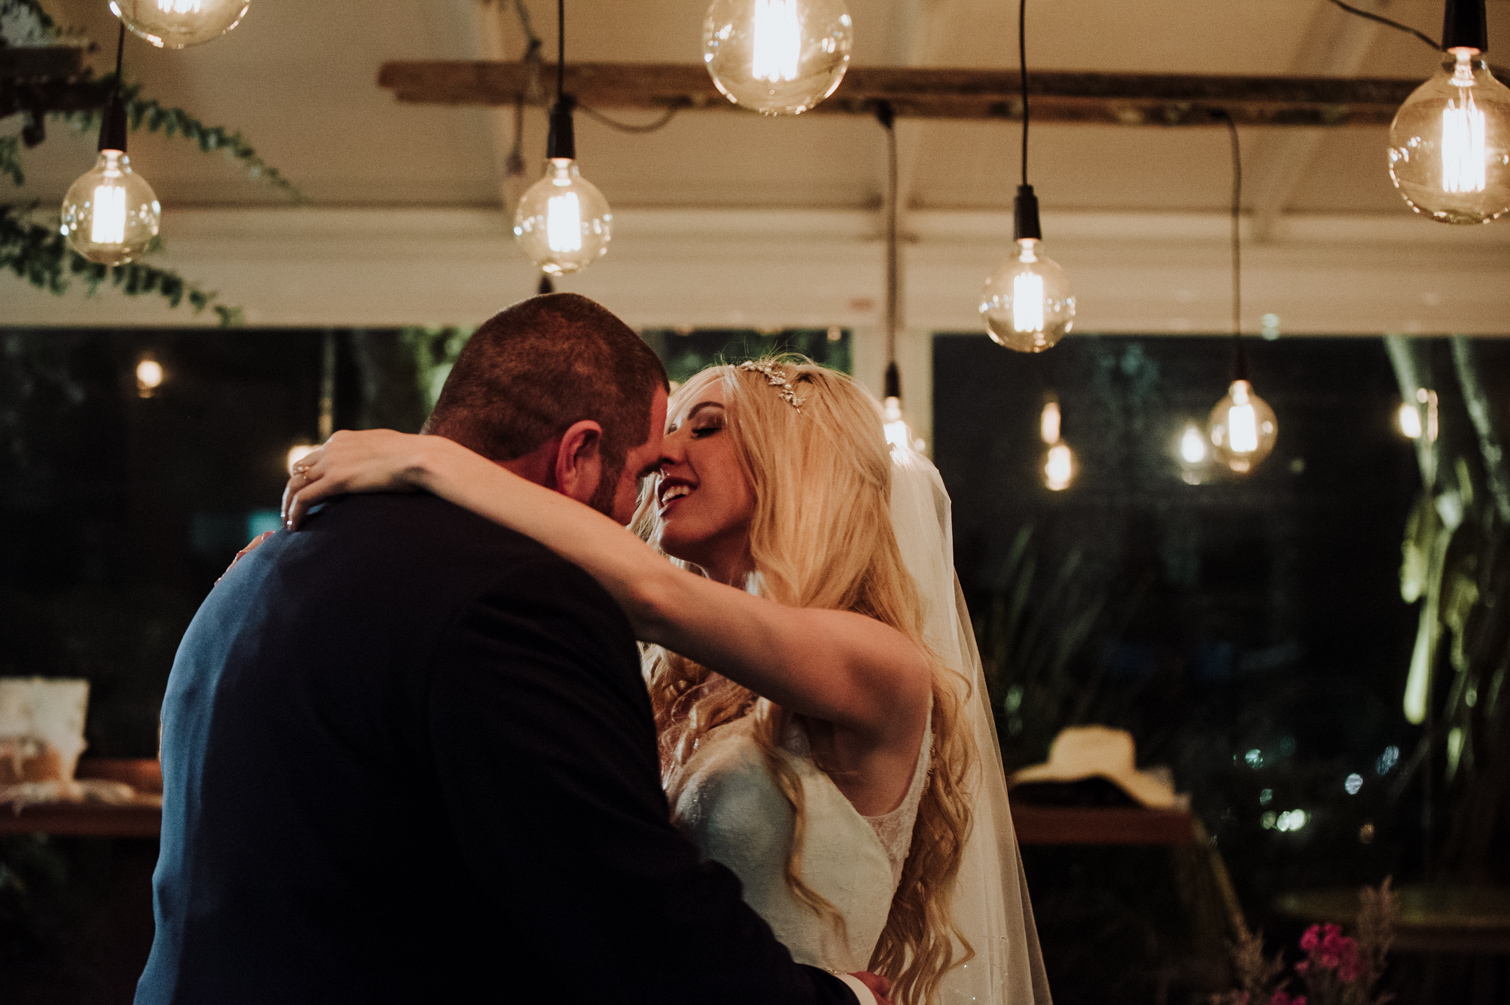 The_Belongil_Byron_Bay_Weddings_New_Black_Studios-234.jpg